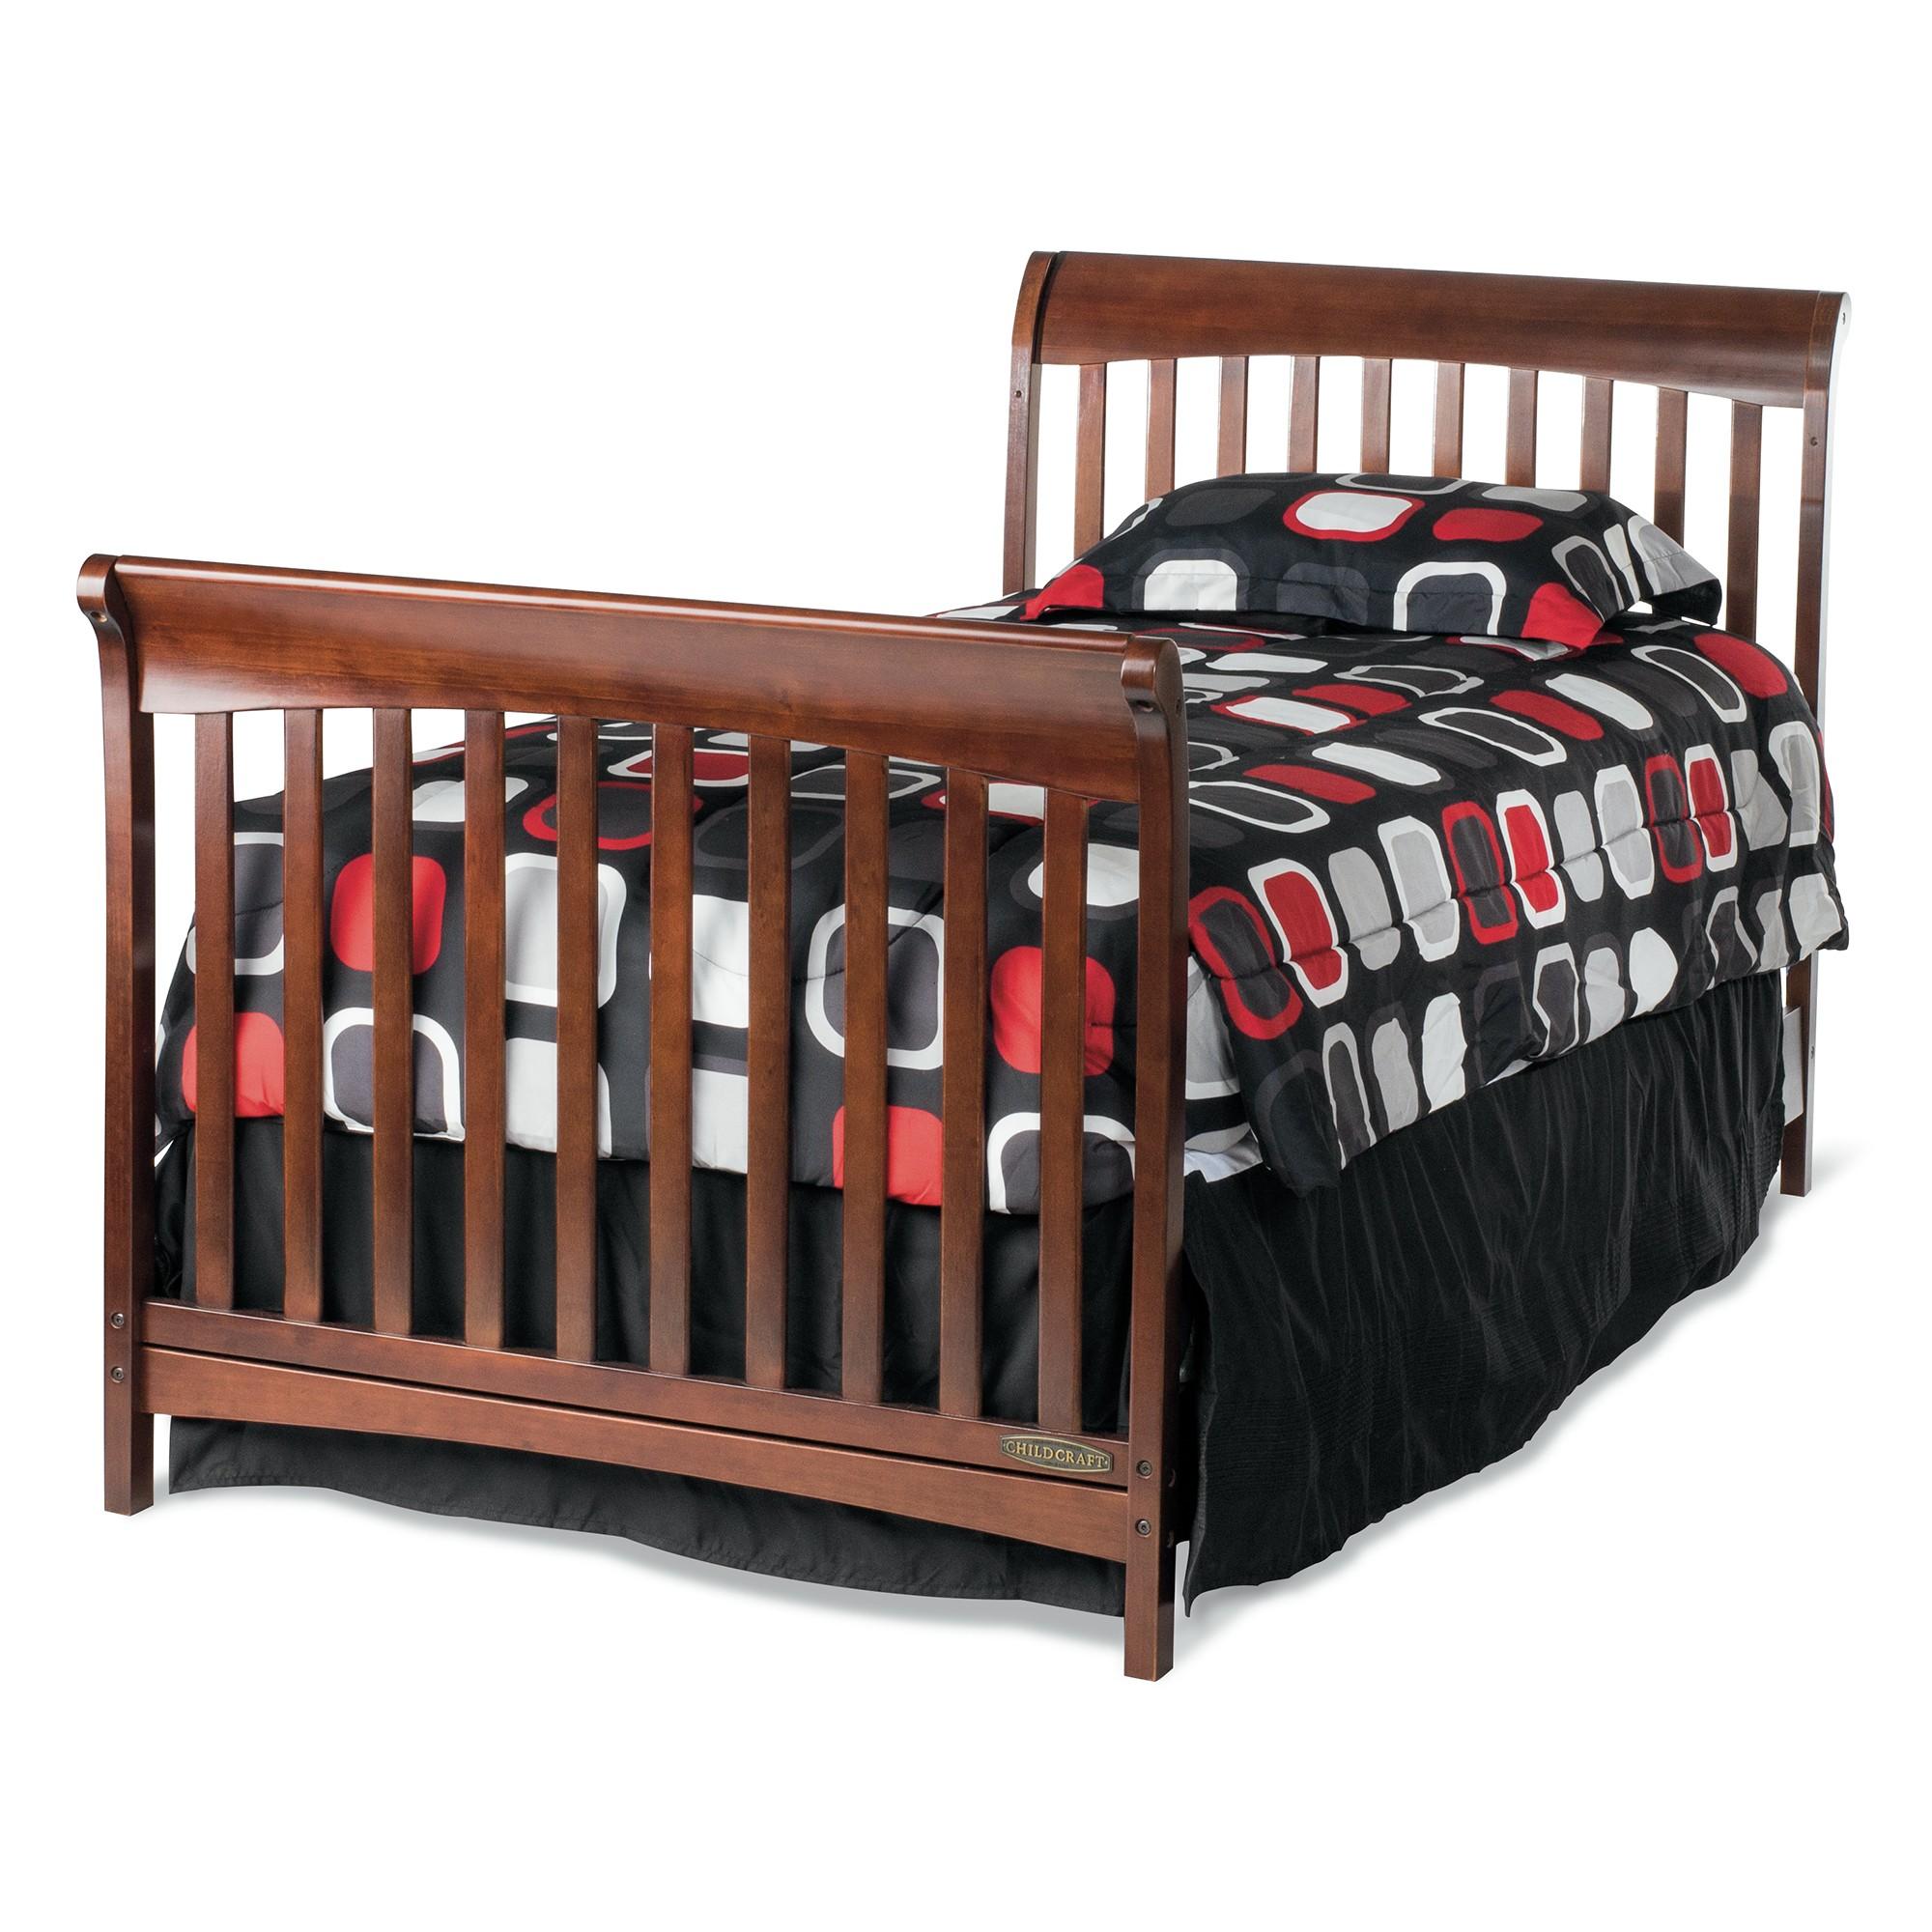 Child craft coventry crib - Child Craft Coventry Crib 30